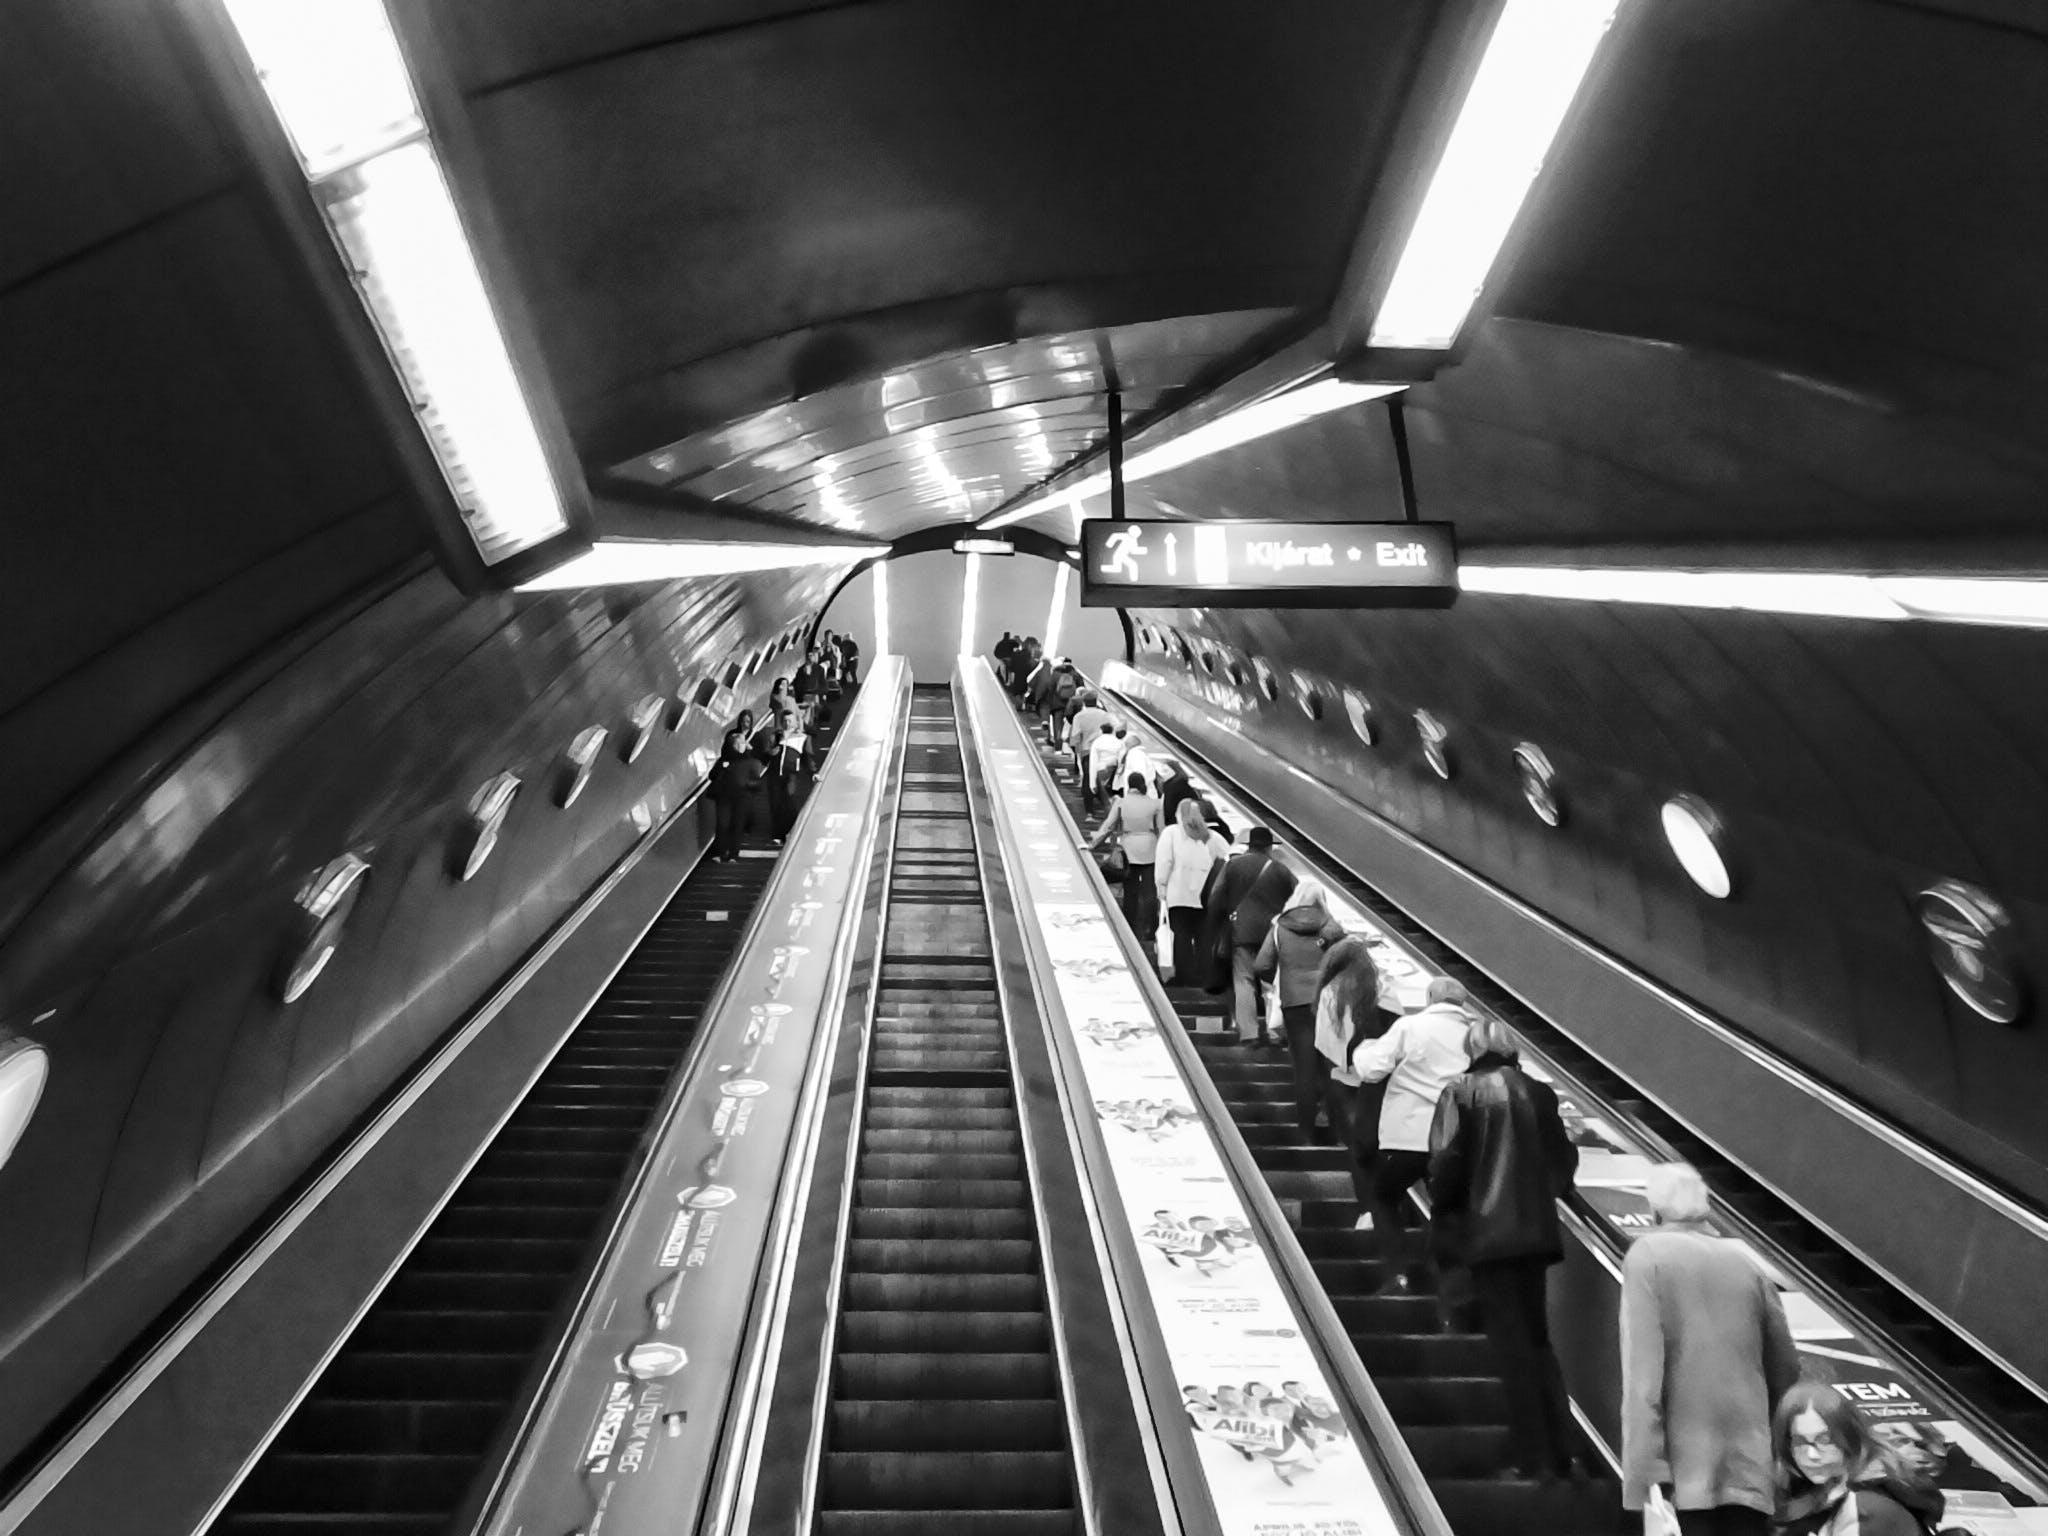 Free stock photo of travel, underground, escalator, metro